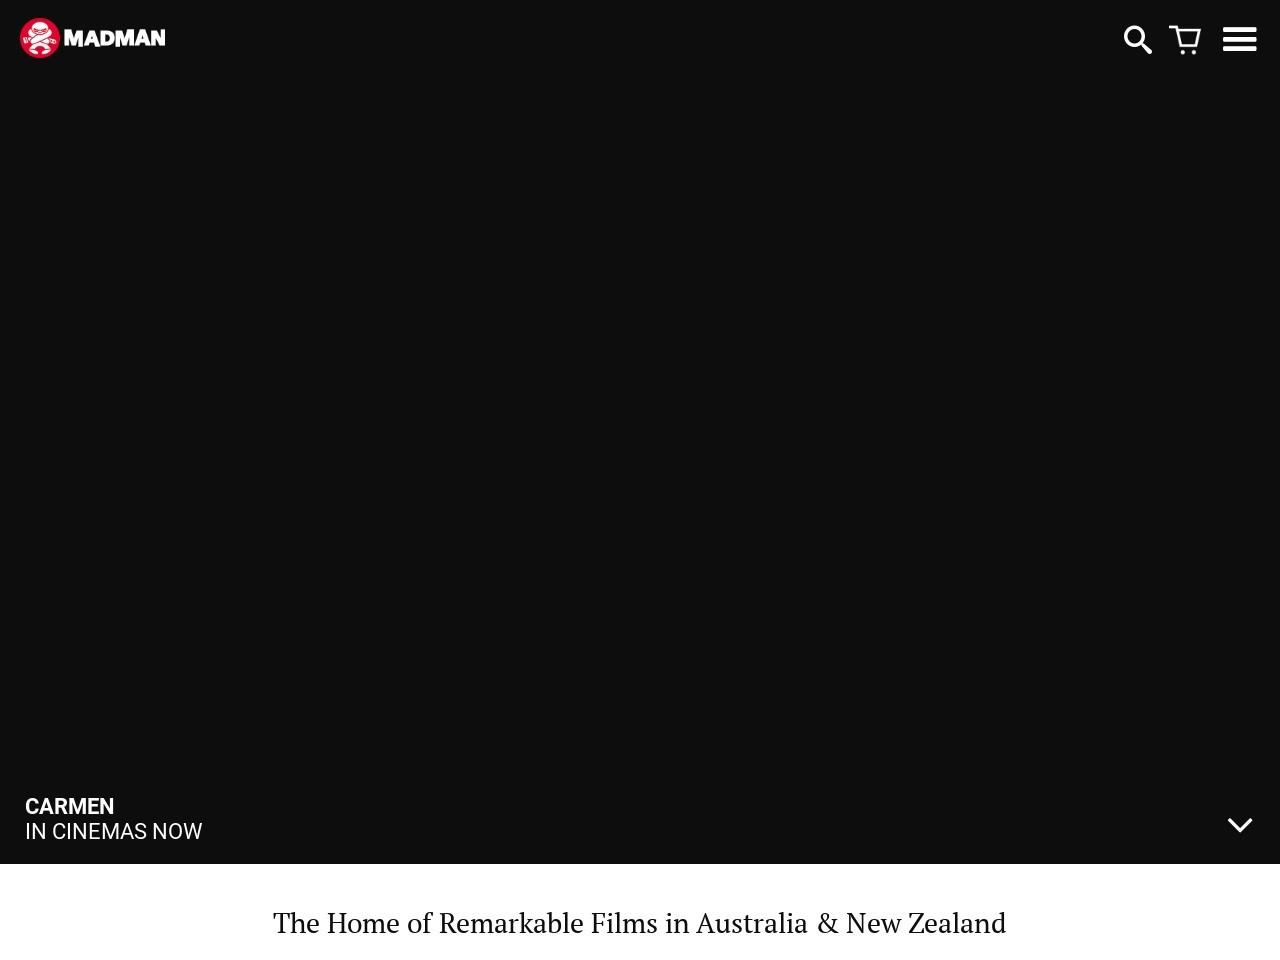 Miyzaki's Heros Immortalised in Art Nouveau | Madman …